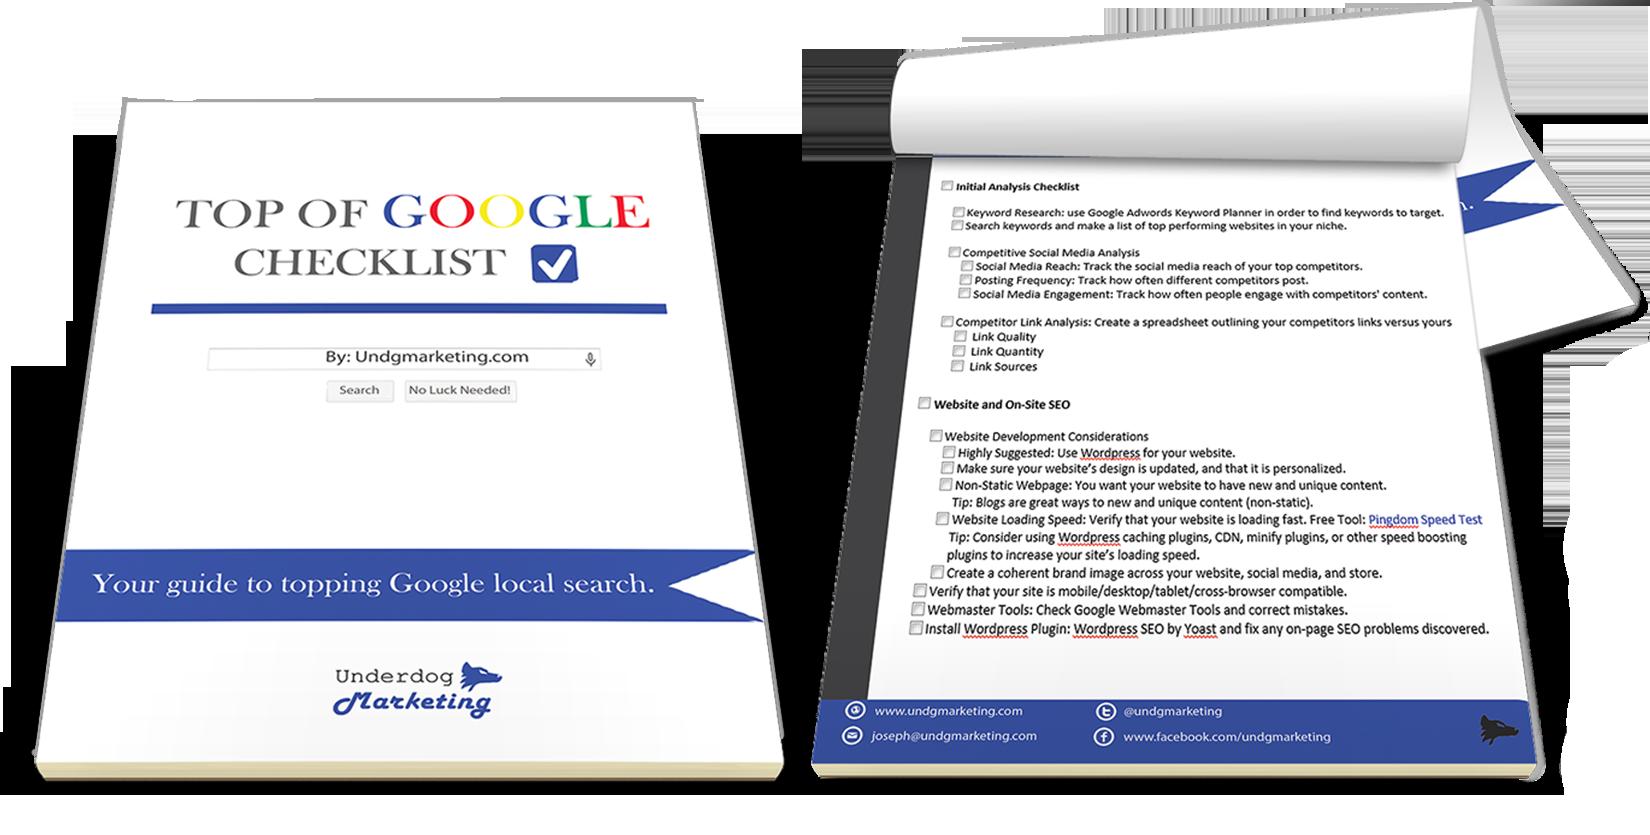 Top of Google Checklist – Learn More - Underdog Marketing